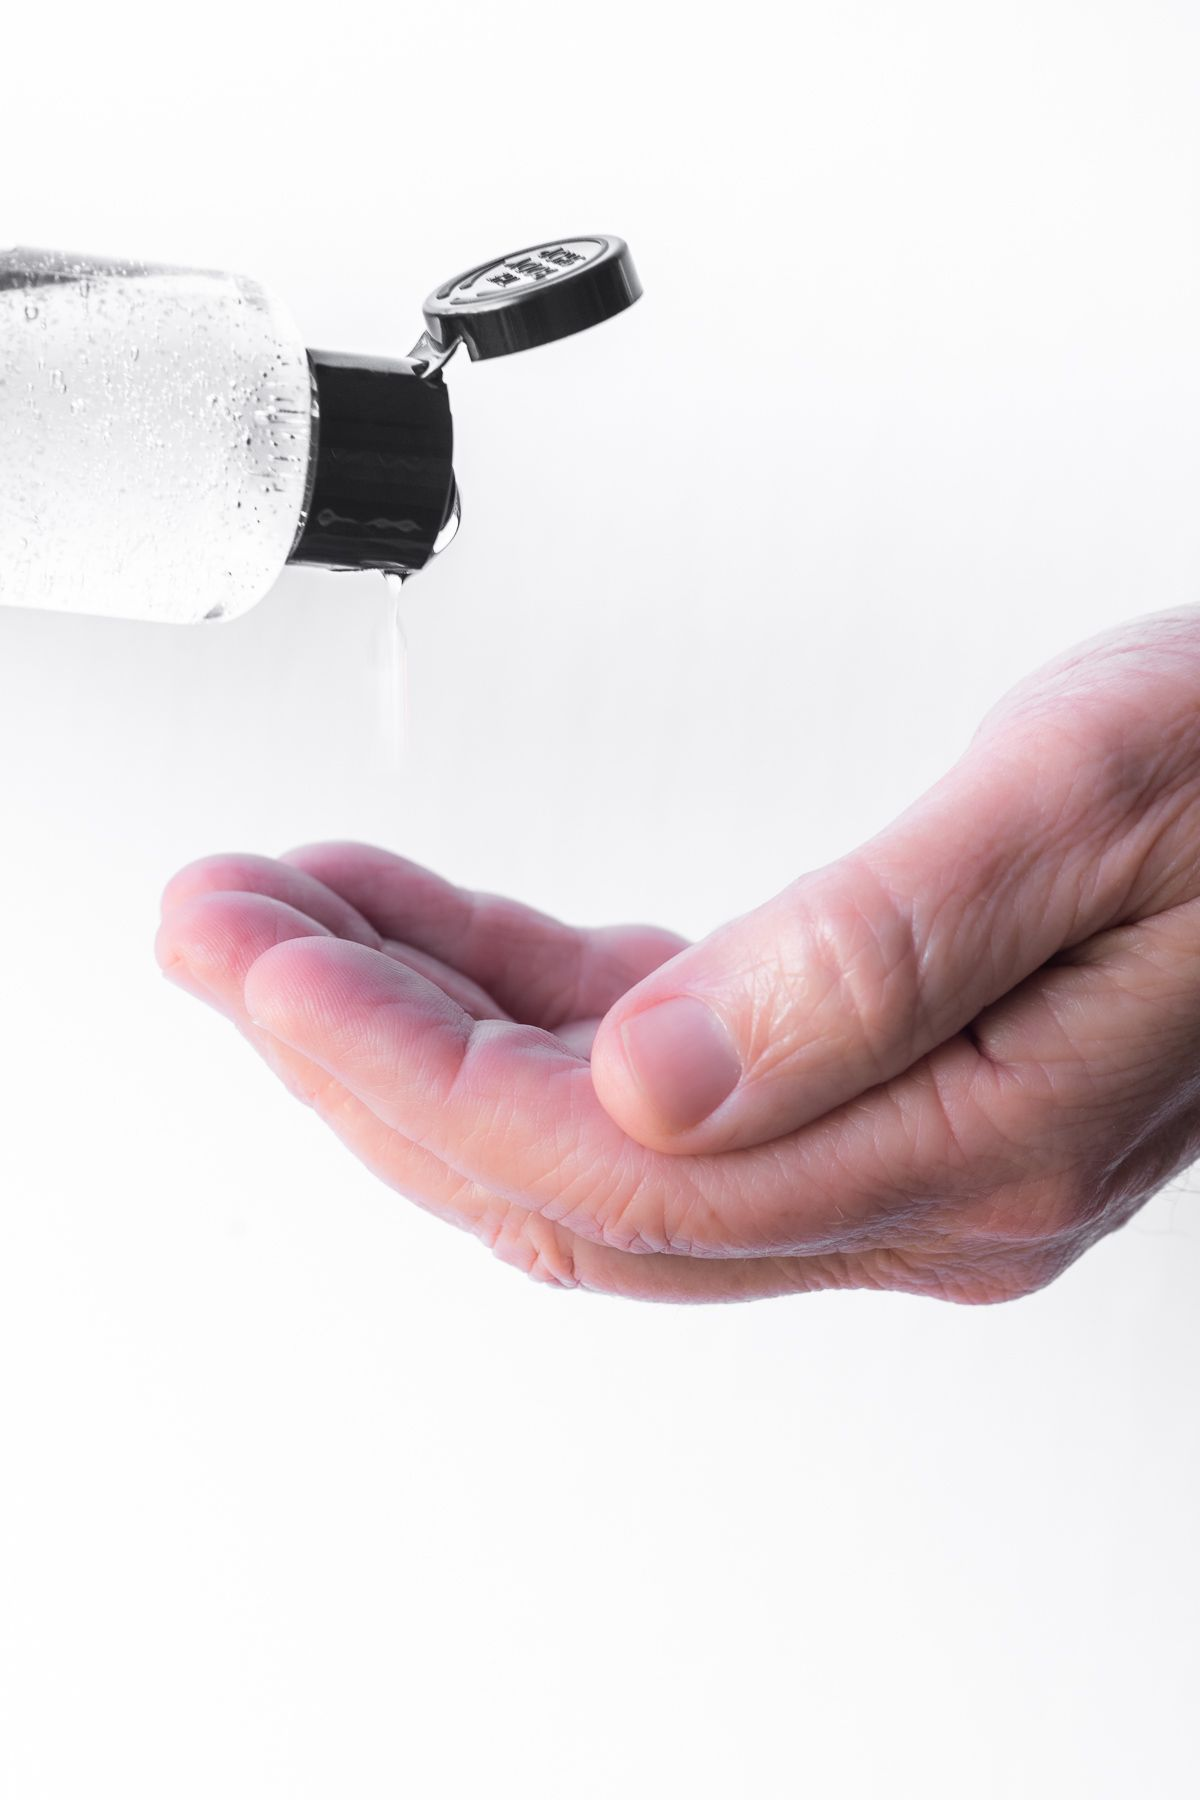 Diy Homemade Hand Sanitizer Effective Homemade Hand Sanitizer